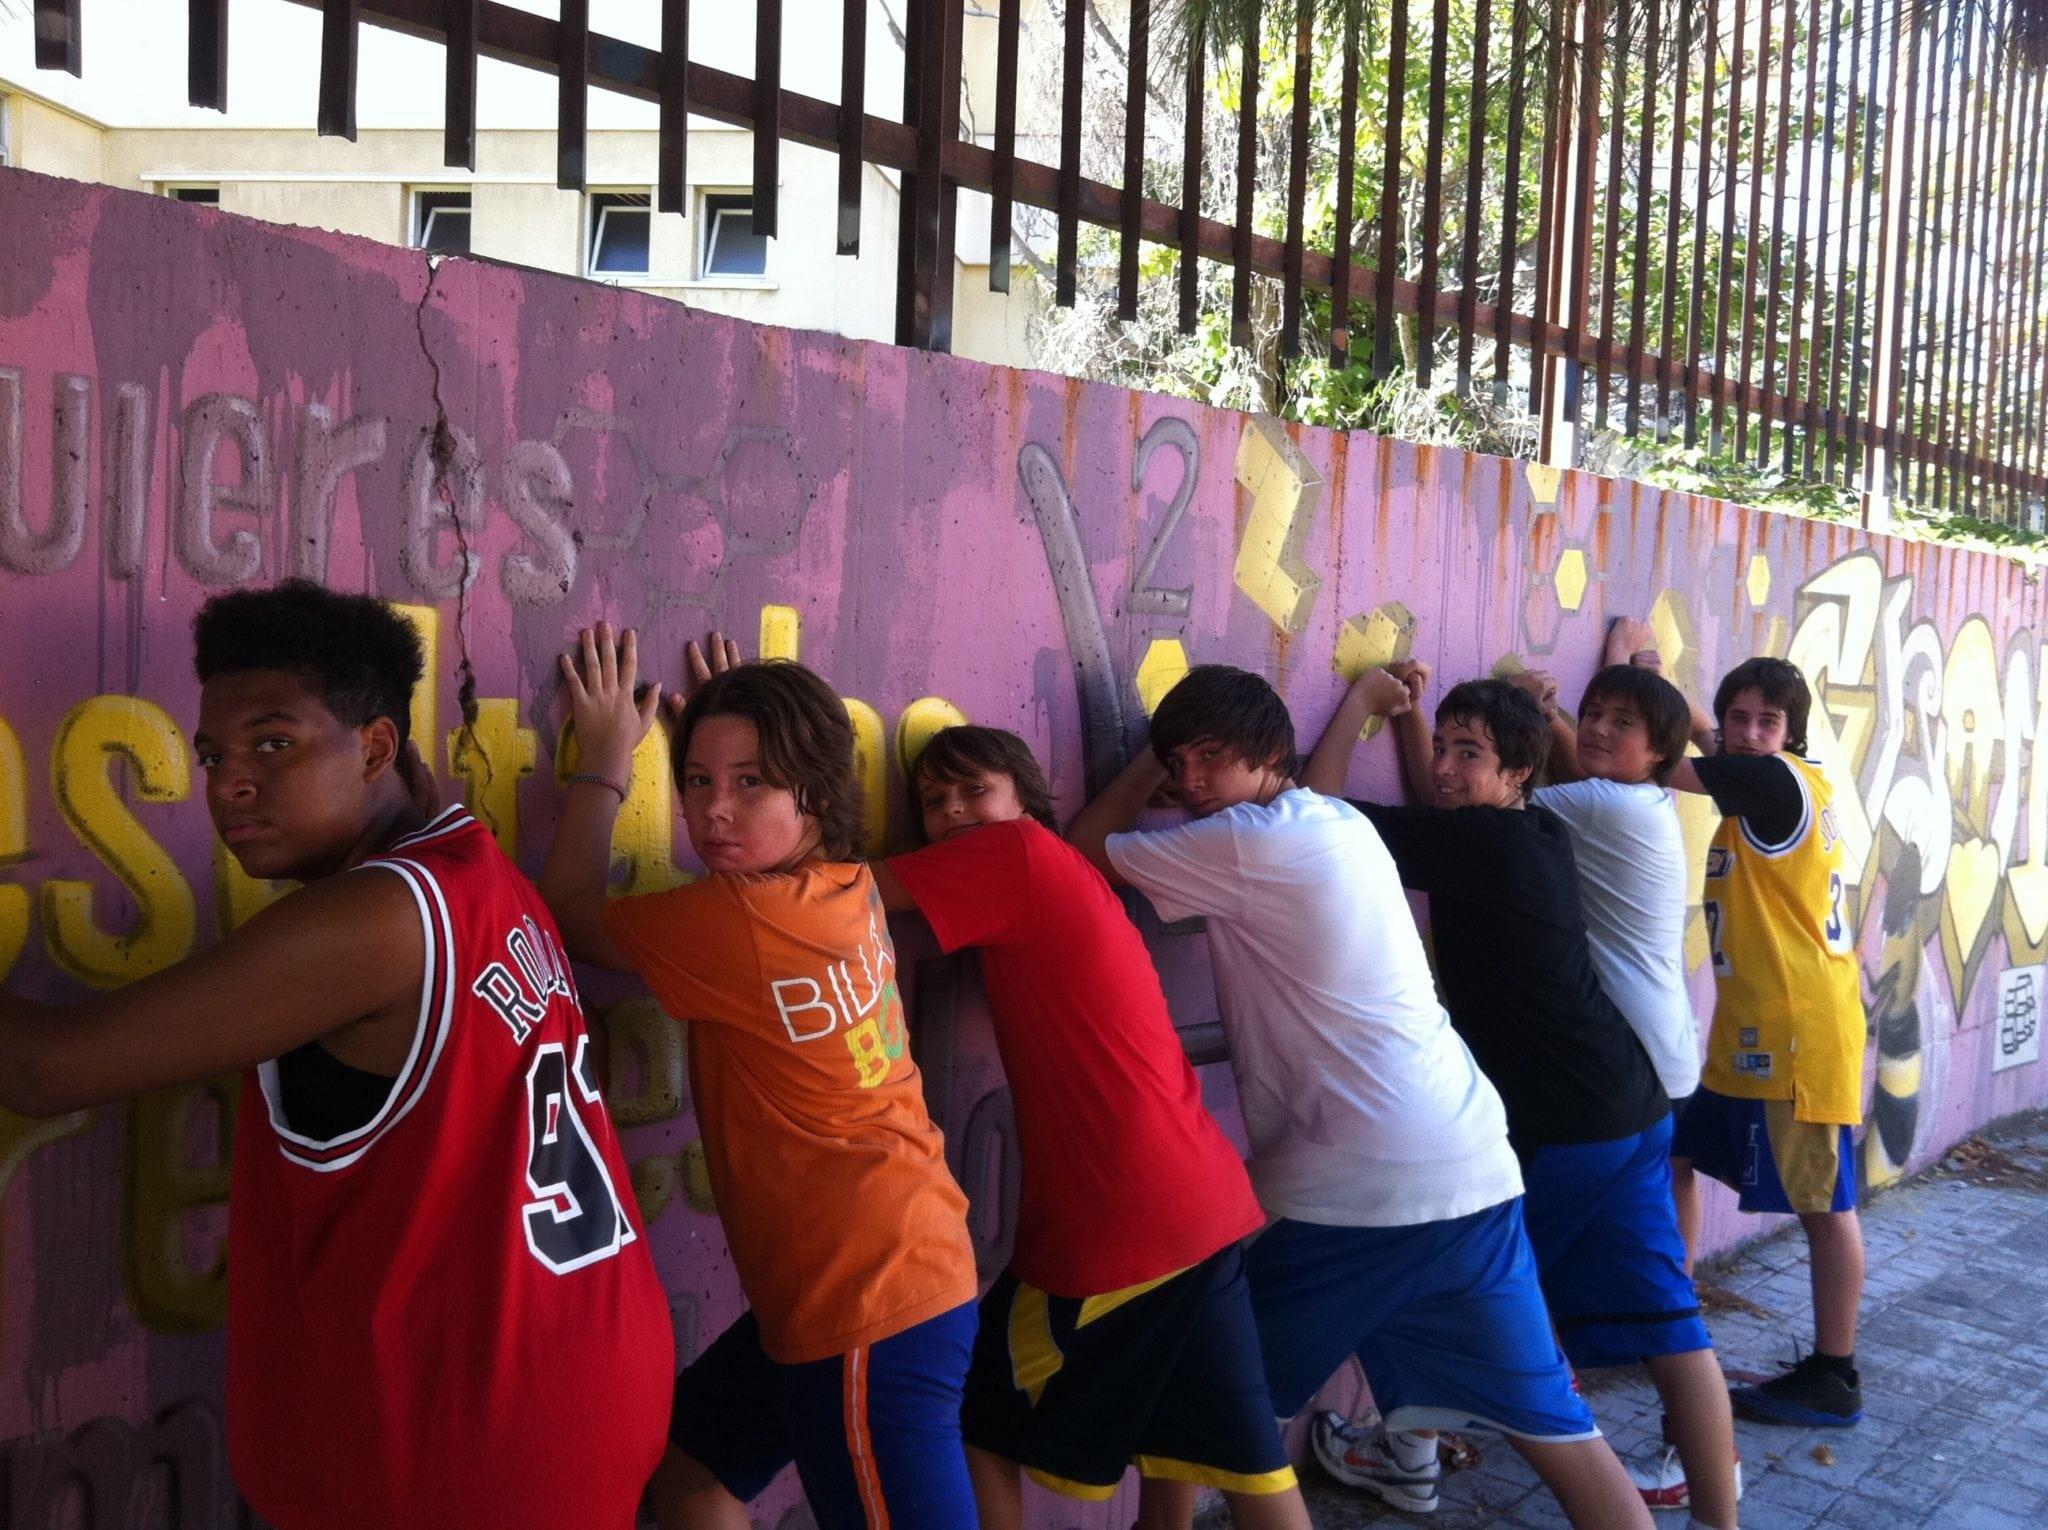 Blog de cantera: estrenar camiseta no dio suerte al Infantil C